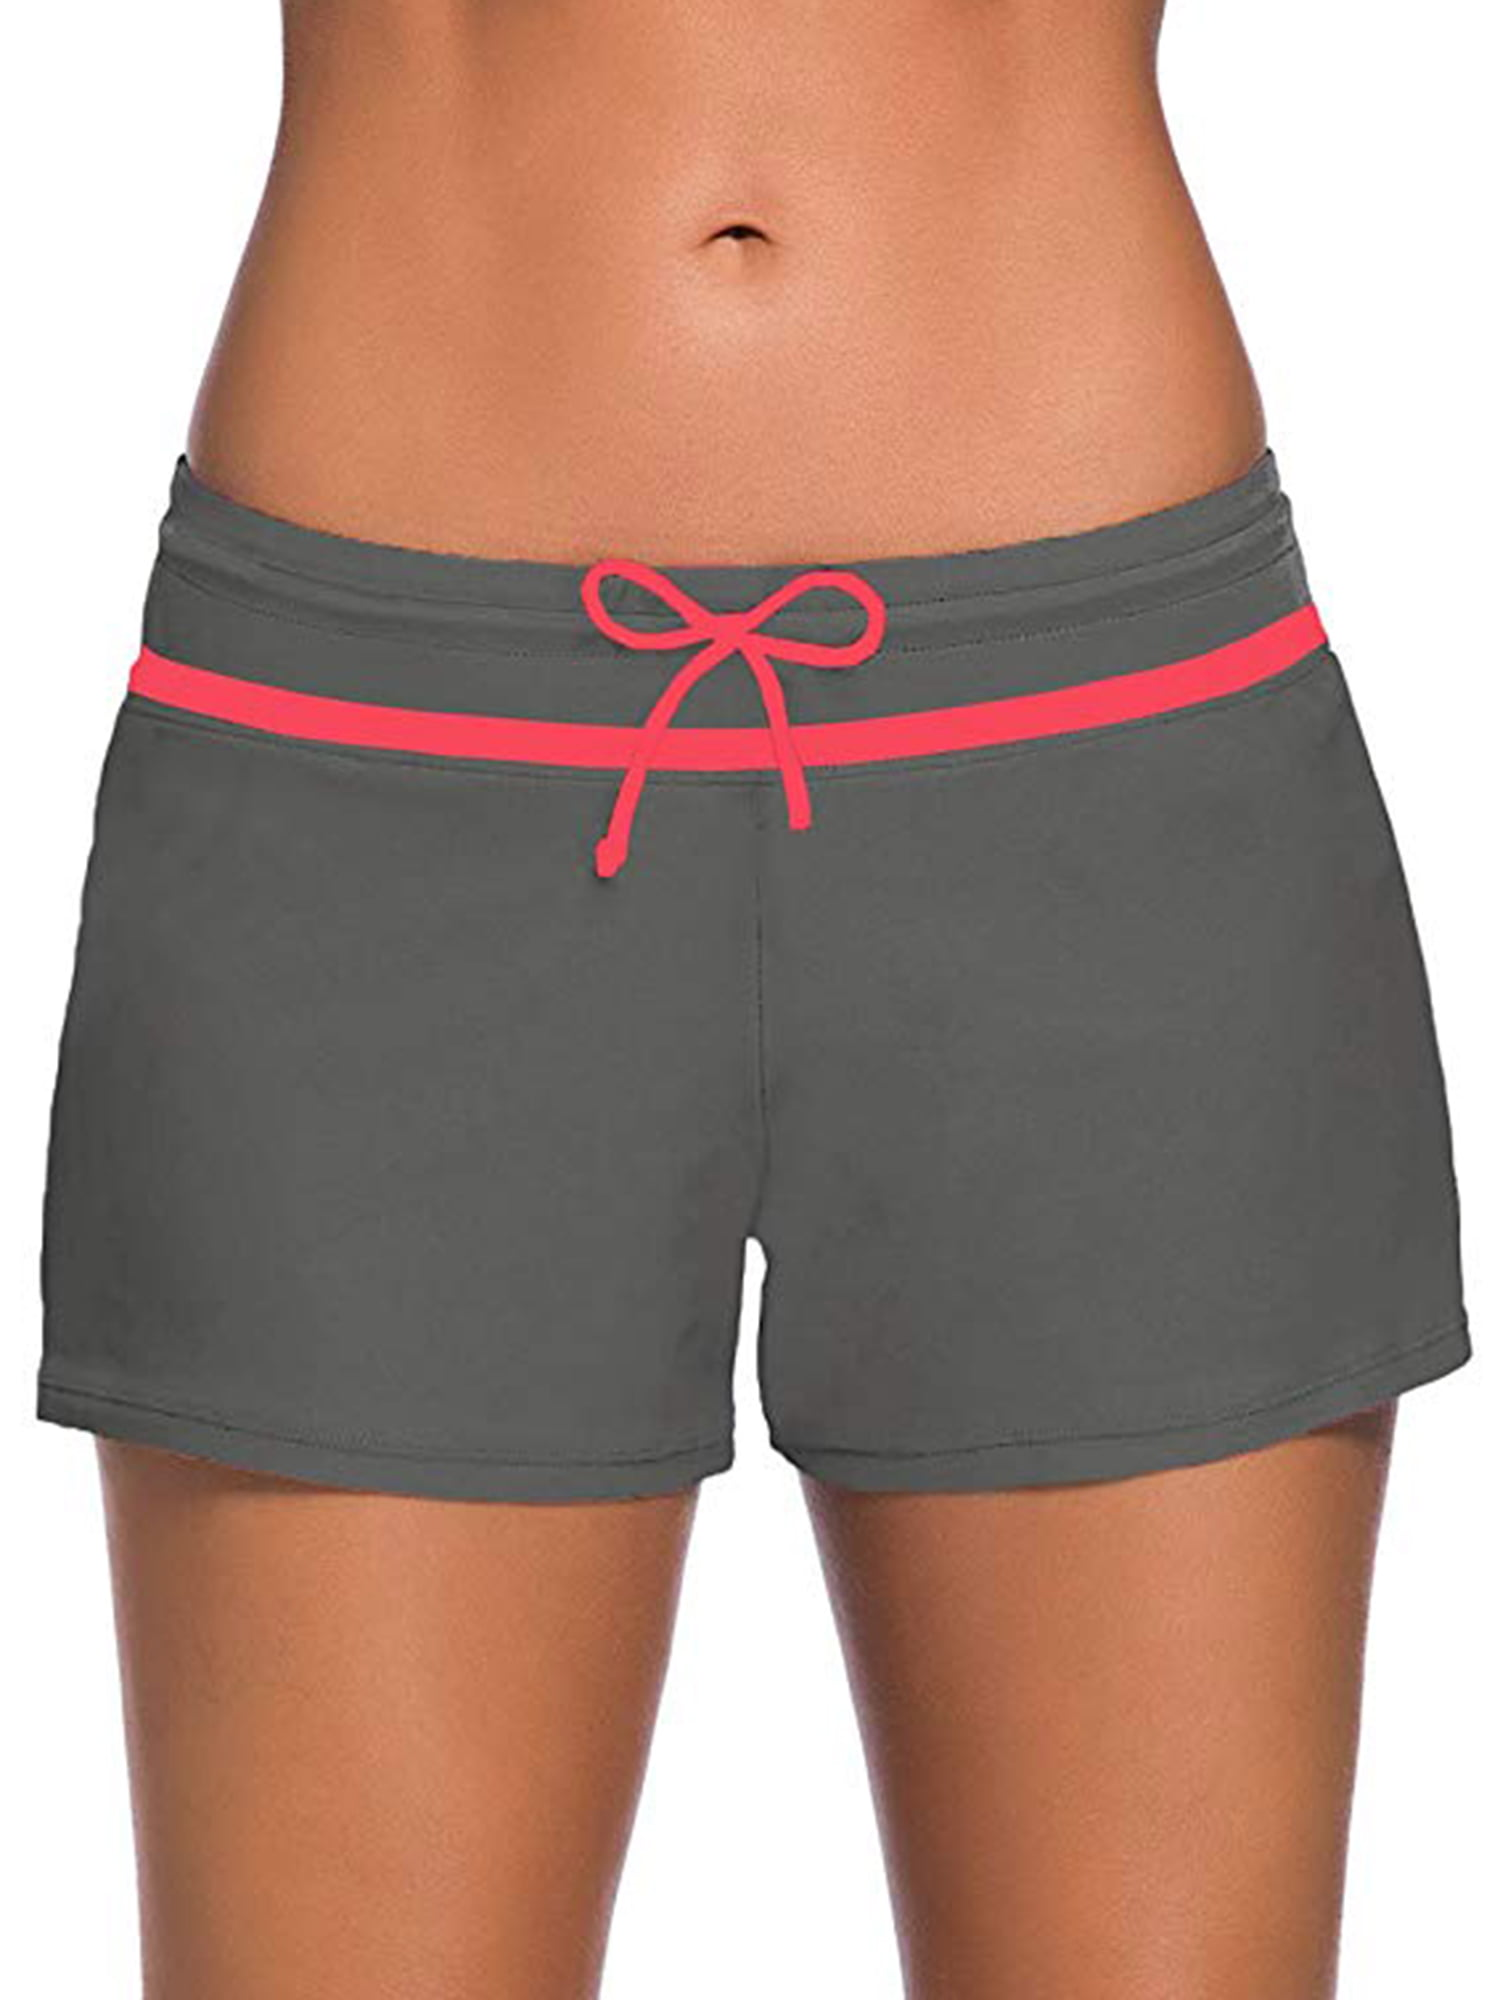 American Trends Womens Swim Shorts for Women Sport Board Shorts Womens Swimwear Tankini Swimsuits Bottoms